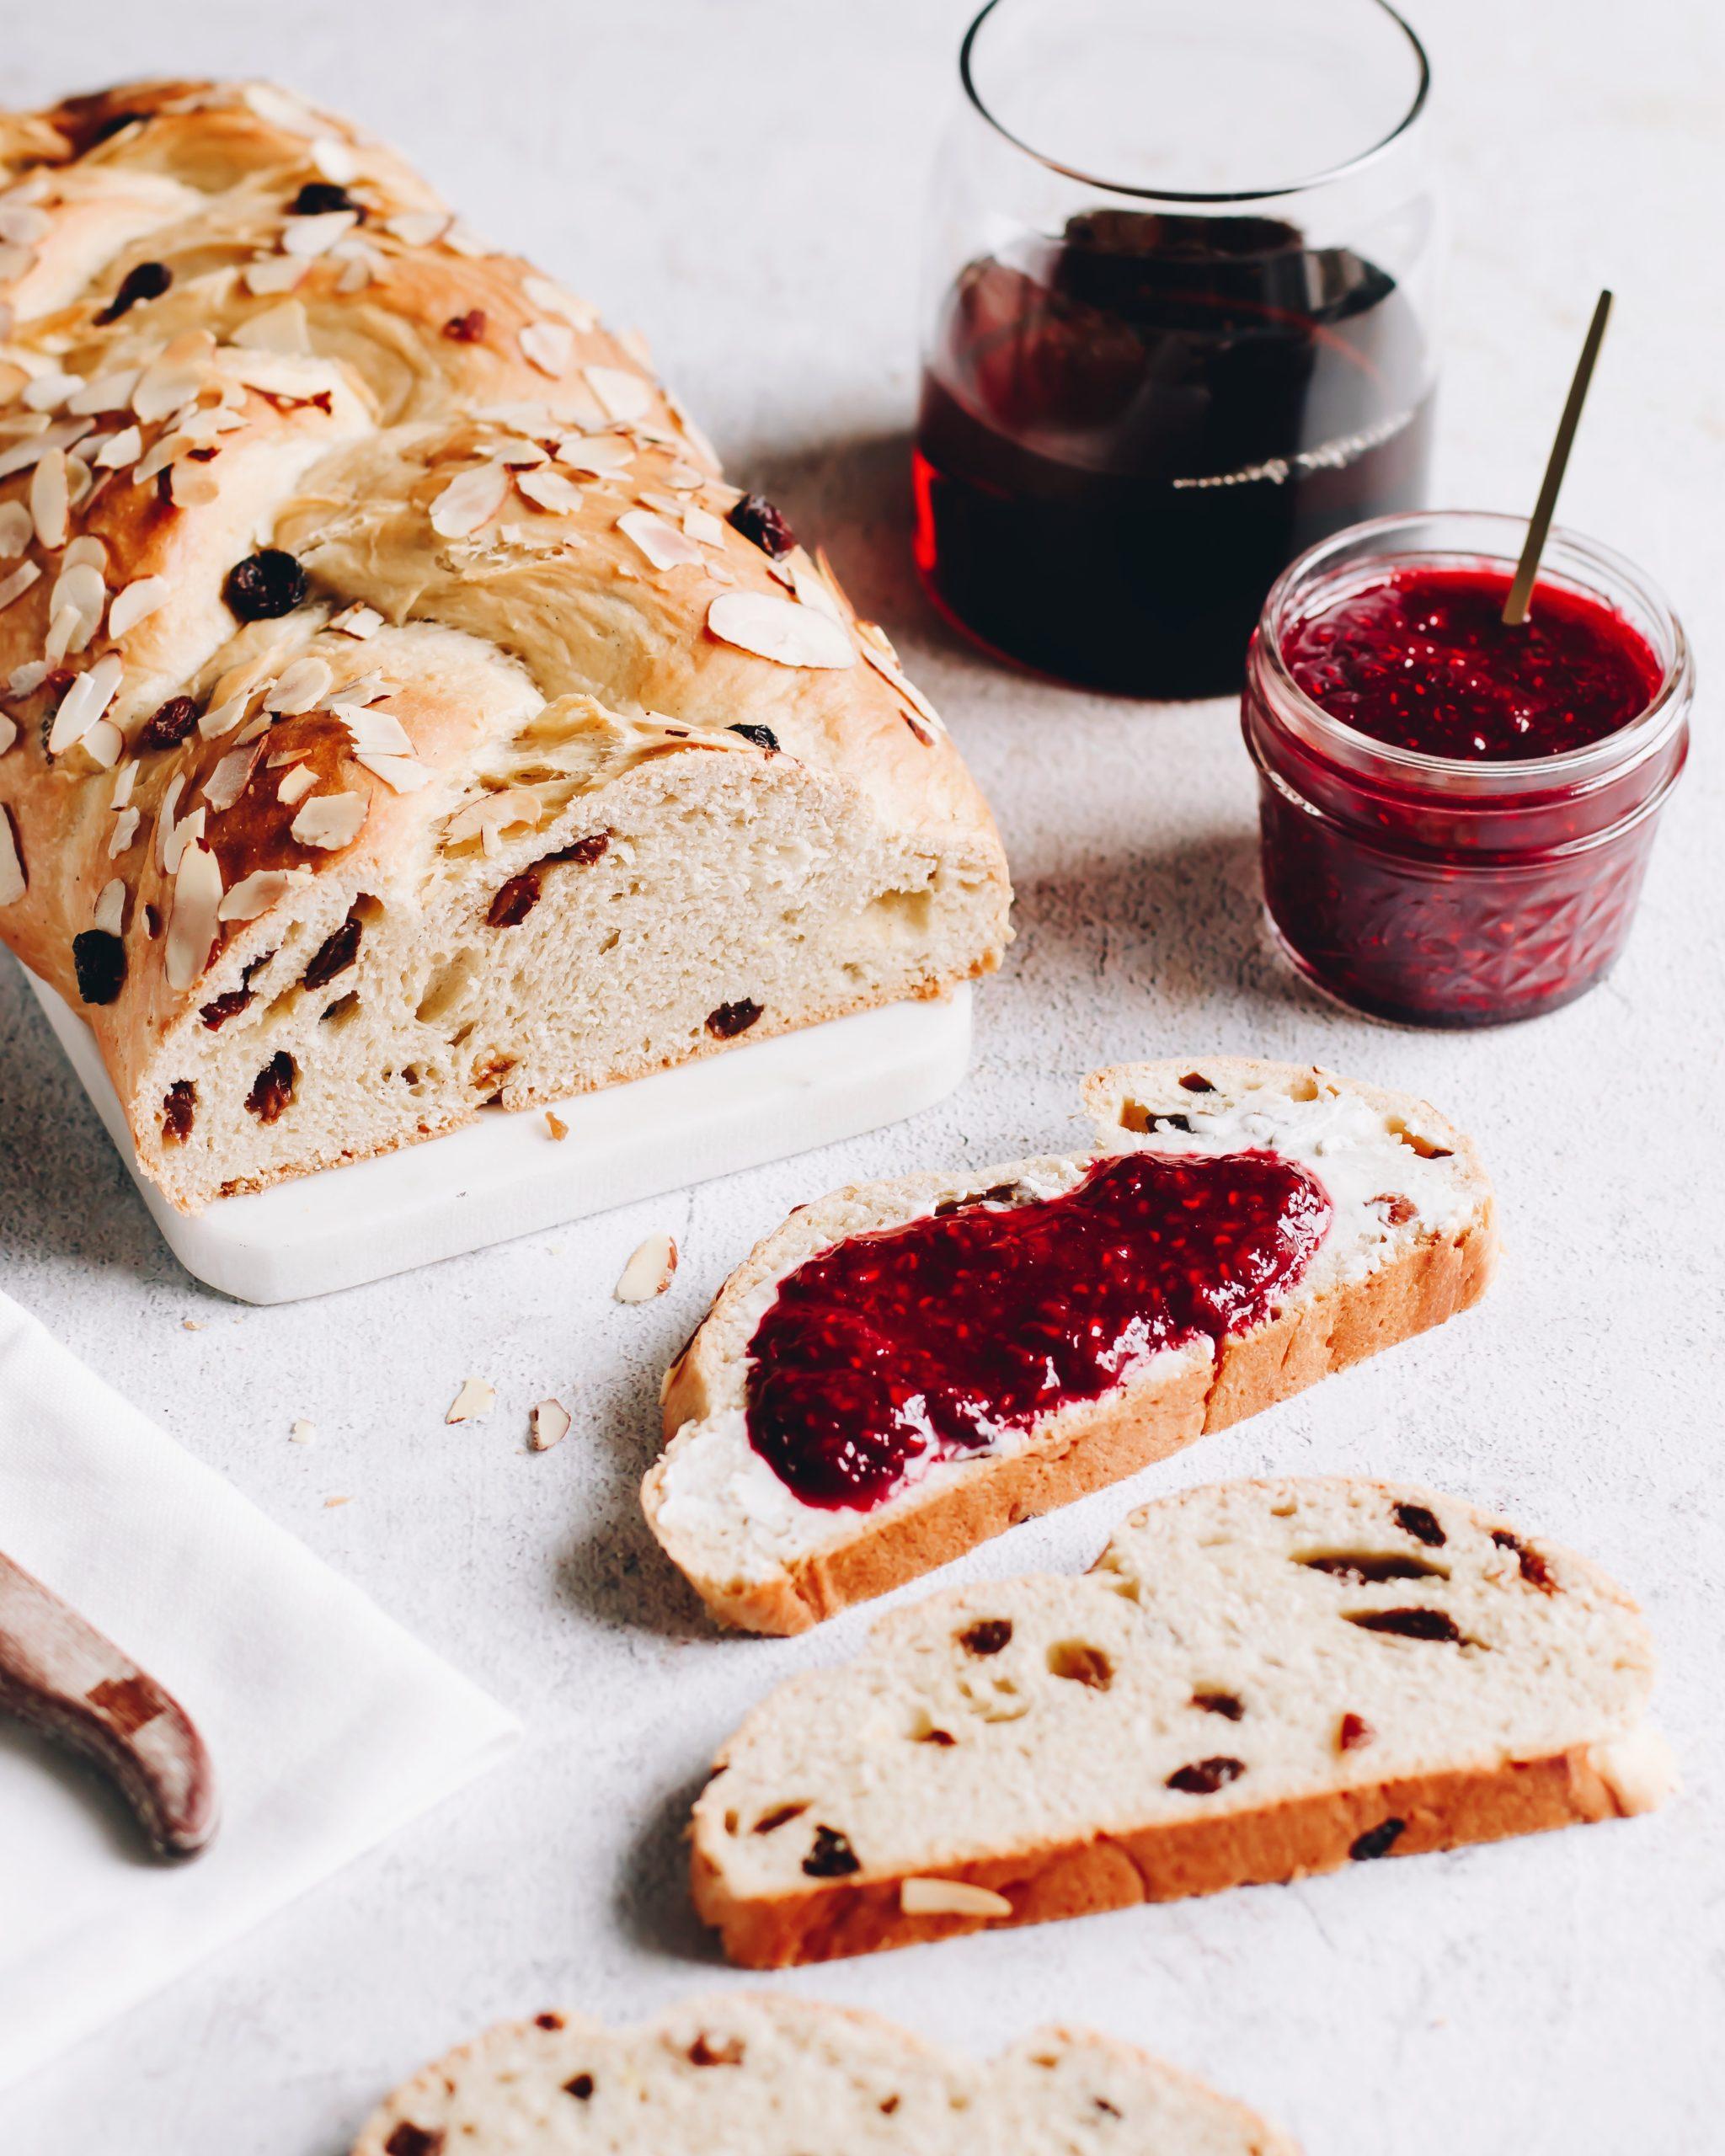 Food Fotografie Hefezopf mit Himbeermarmelade